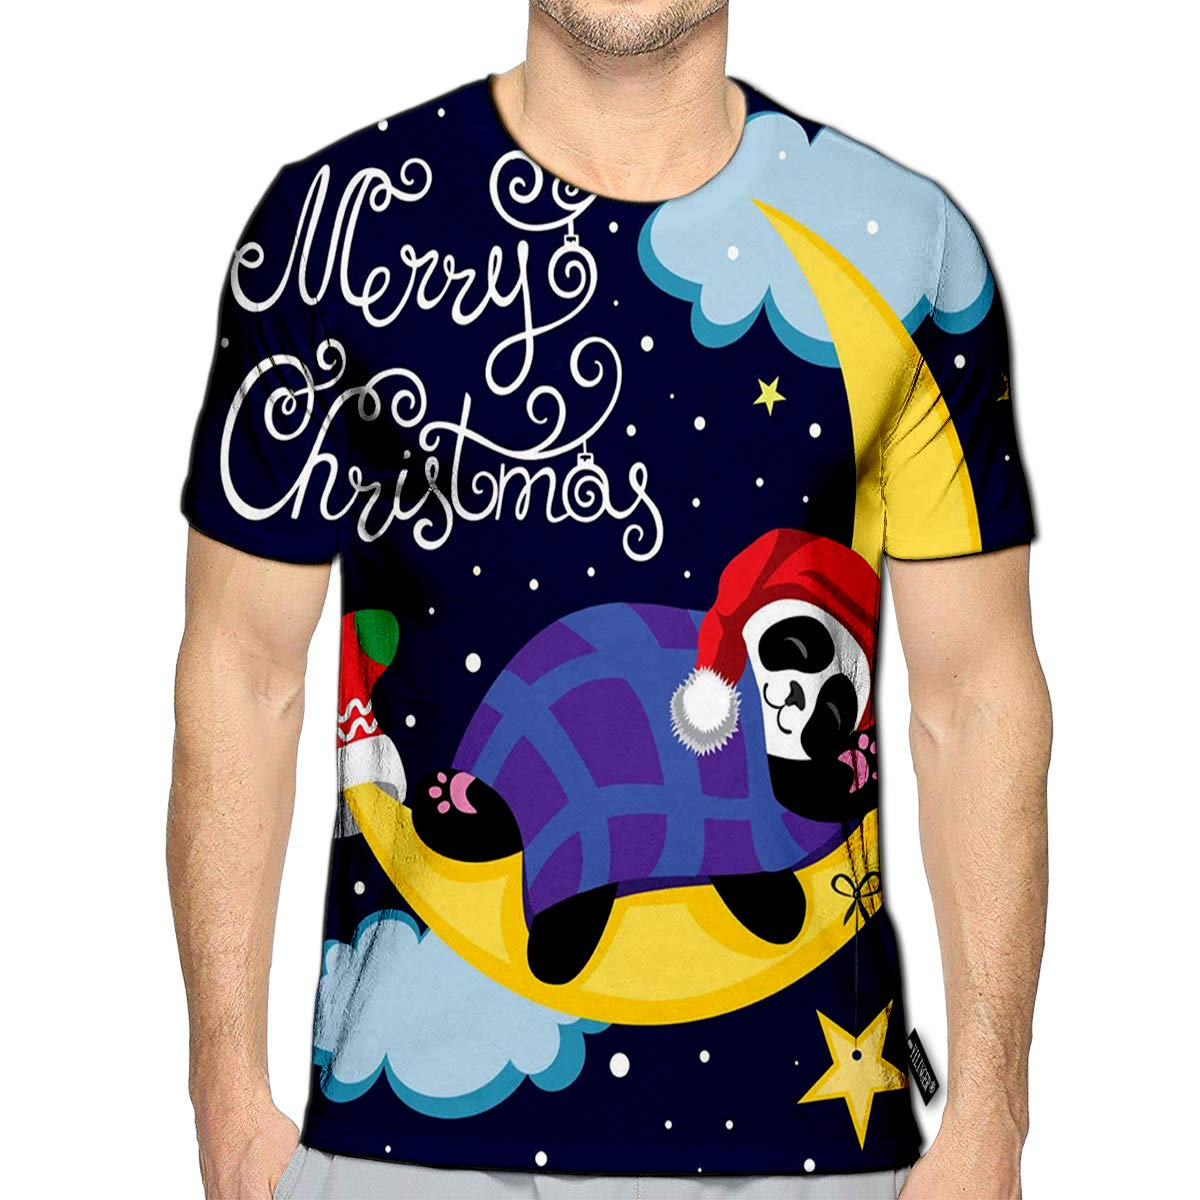 3D Printed T-Shirts Panda Sleeps On The Moon is in Starry Sky of Cartoon Calligraphy Short Sleeve Tops Tees